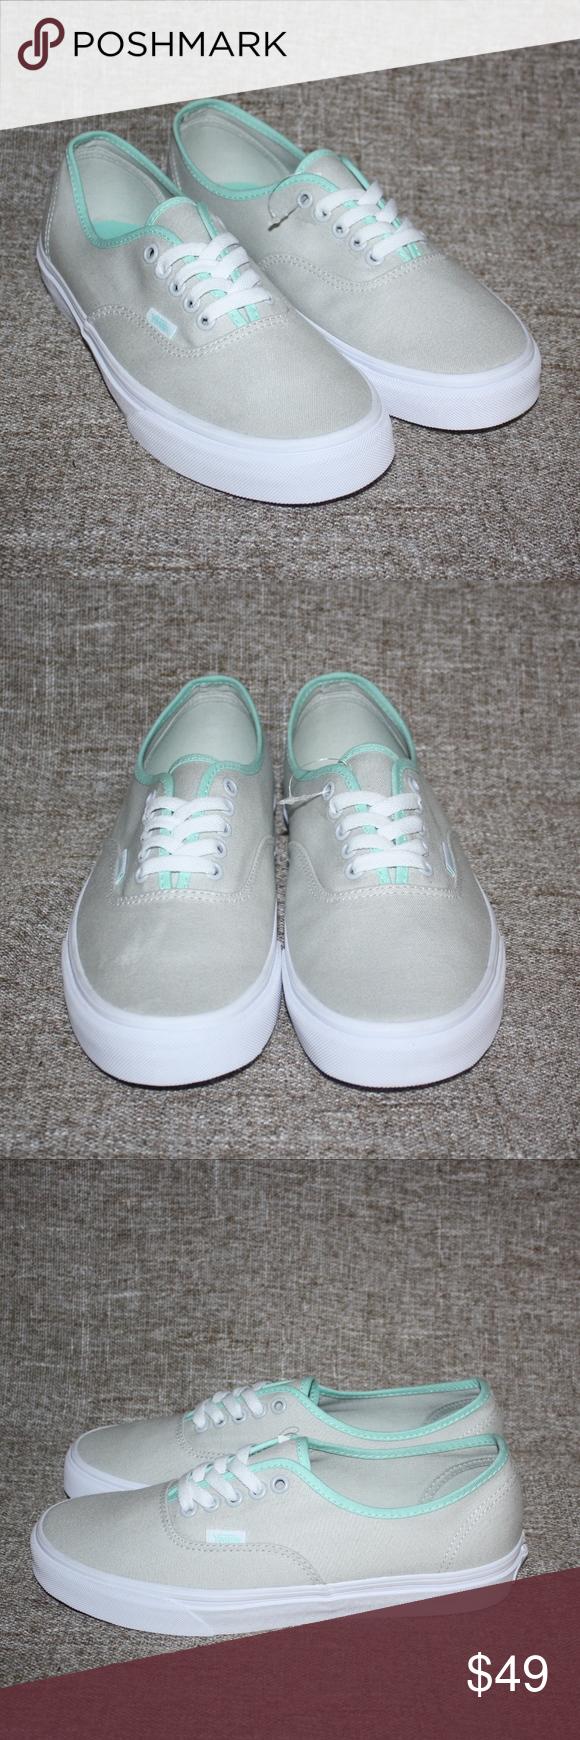 vans gray \u0026 mint green authentic shoes